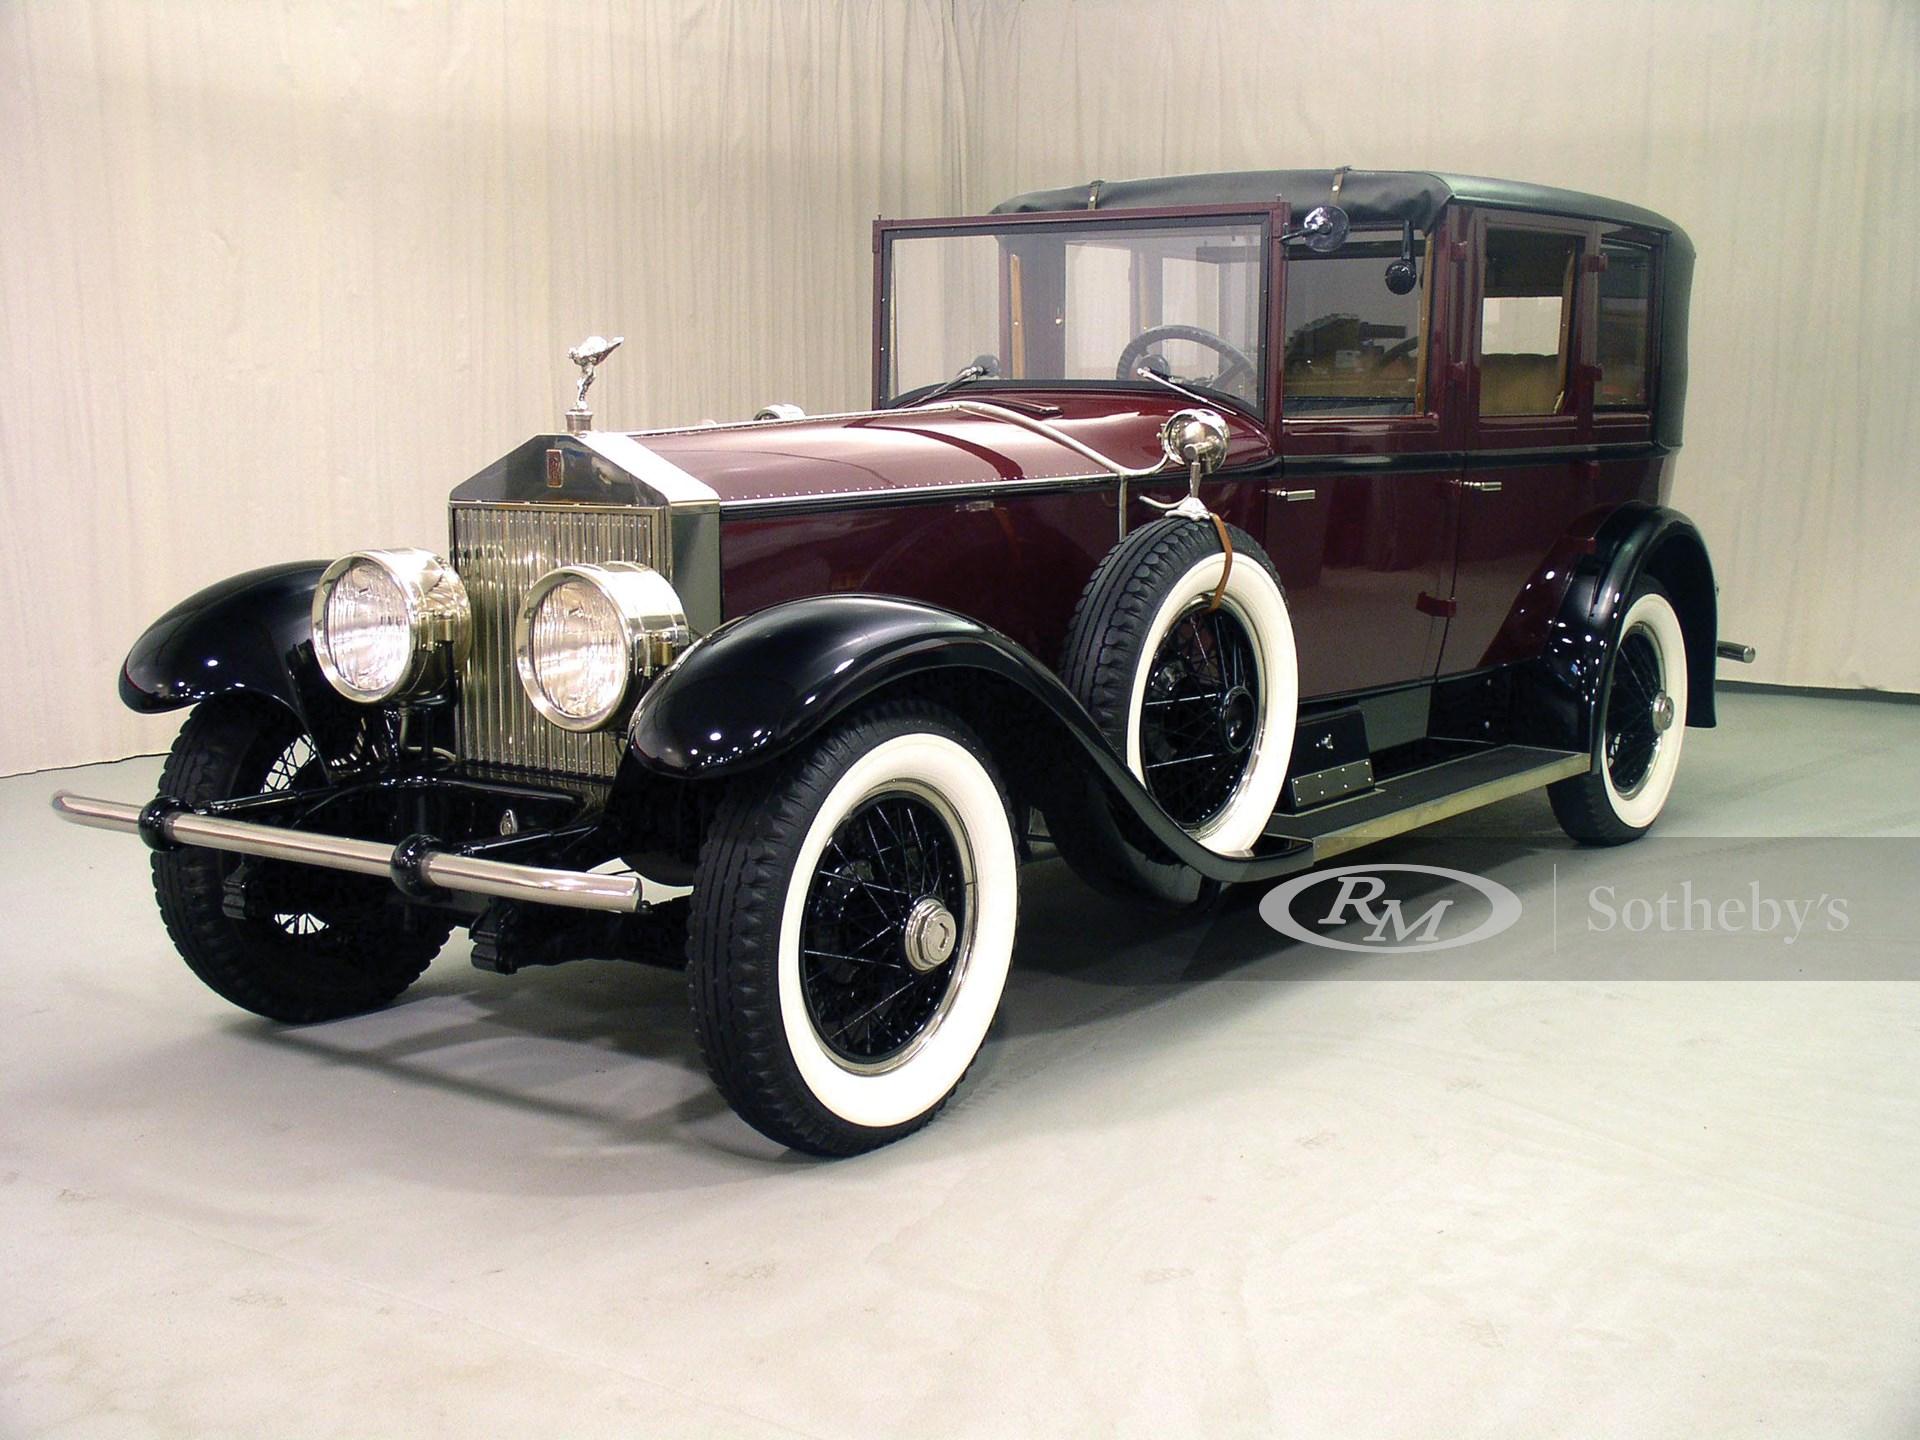 1927 Rolls-Royce Phantom I Springfield Town Car